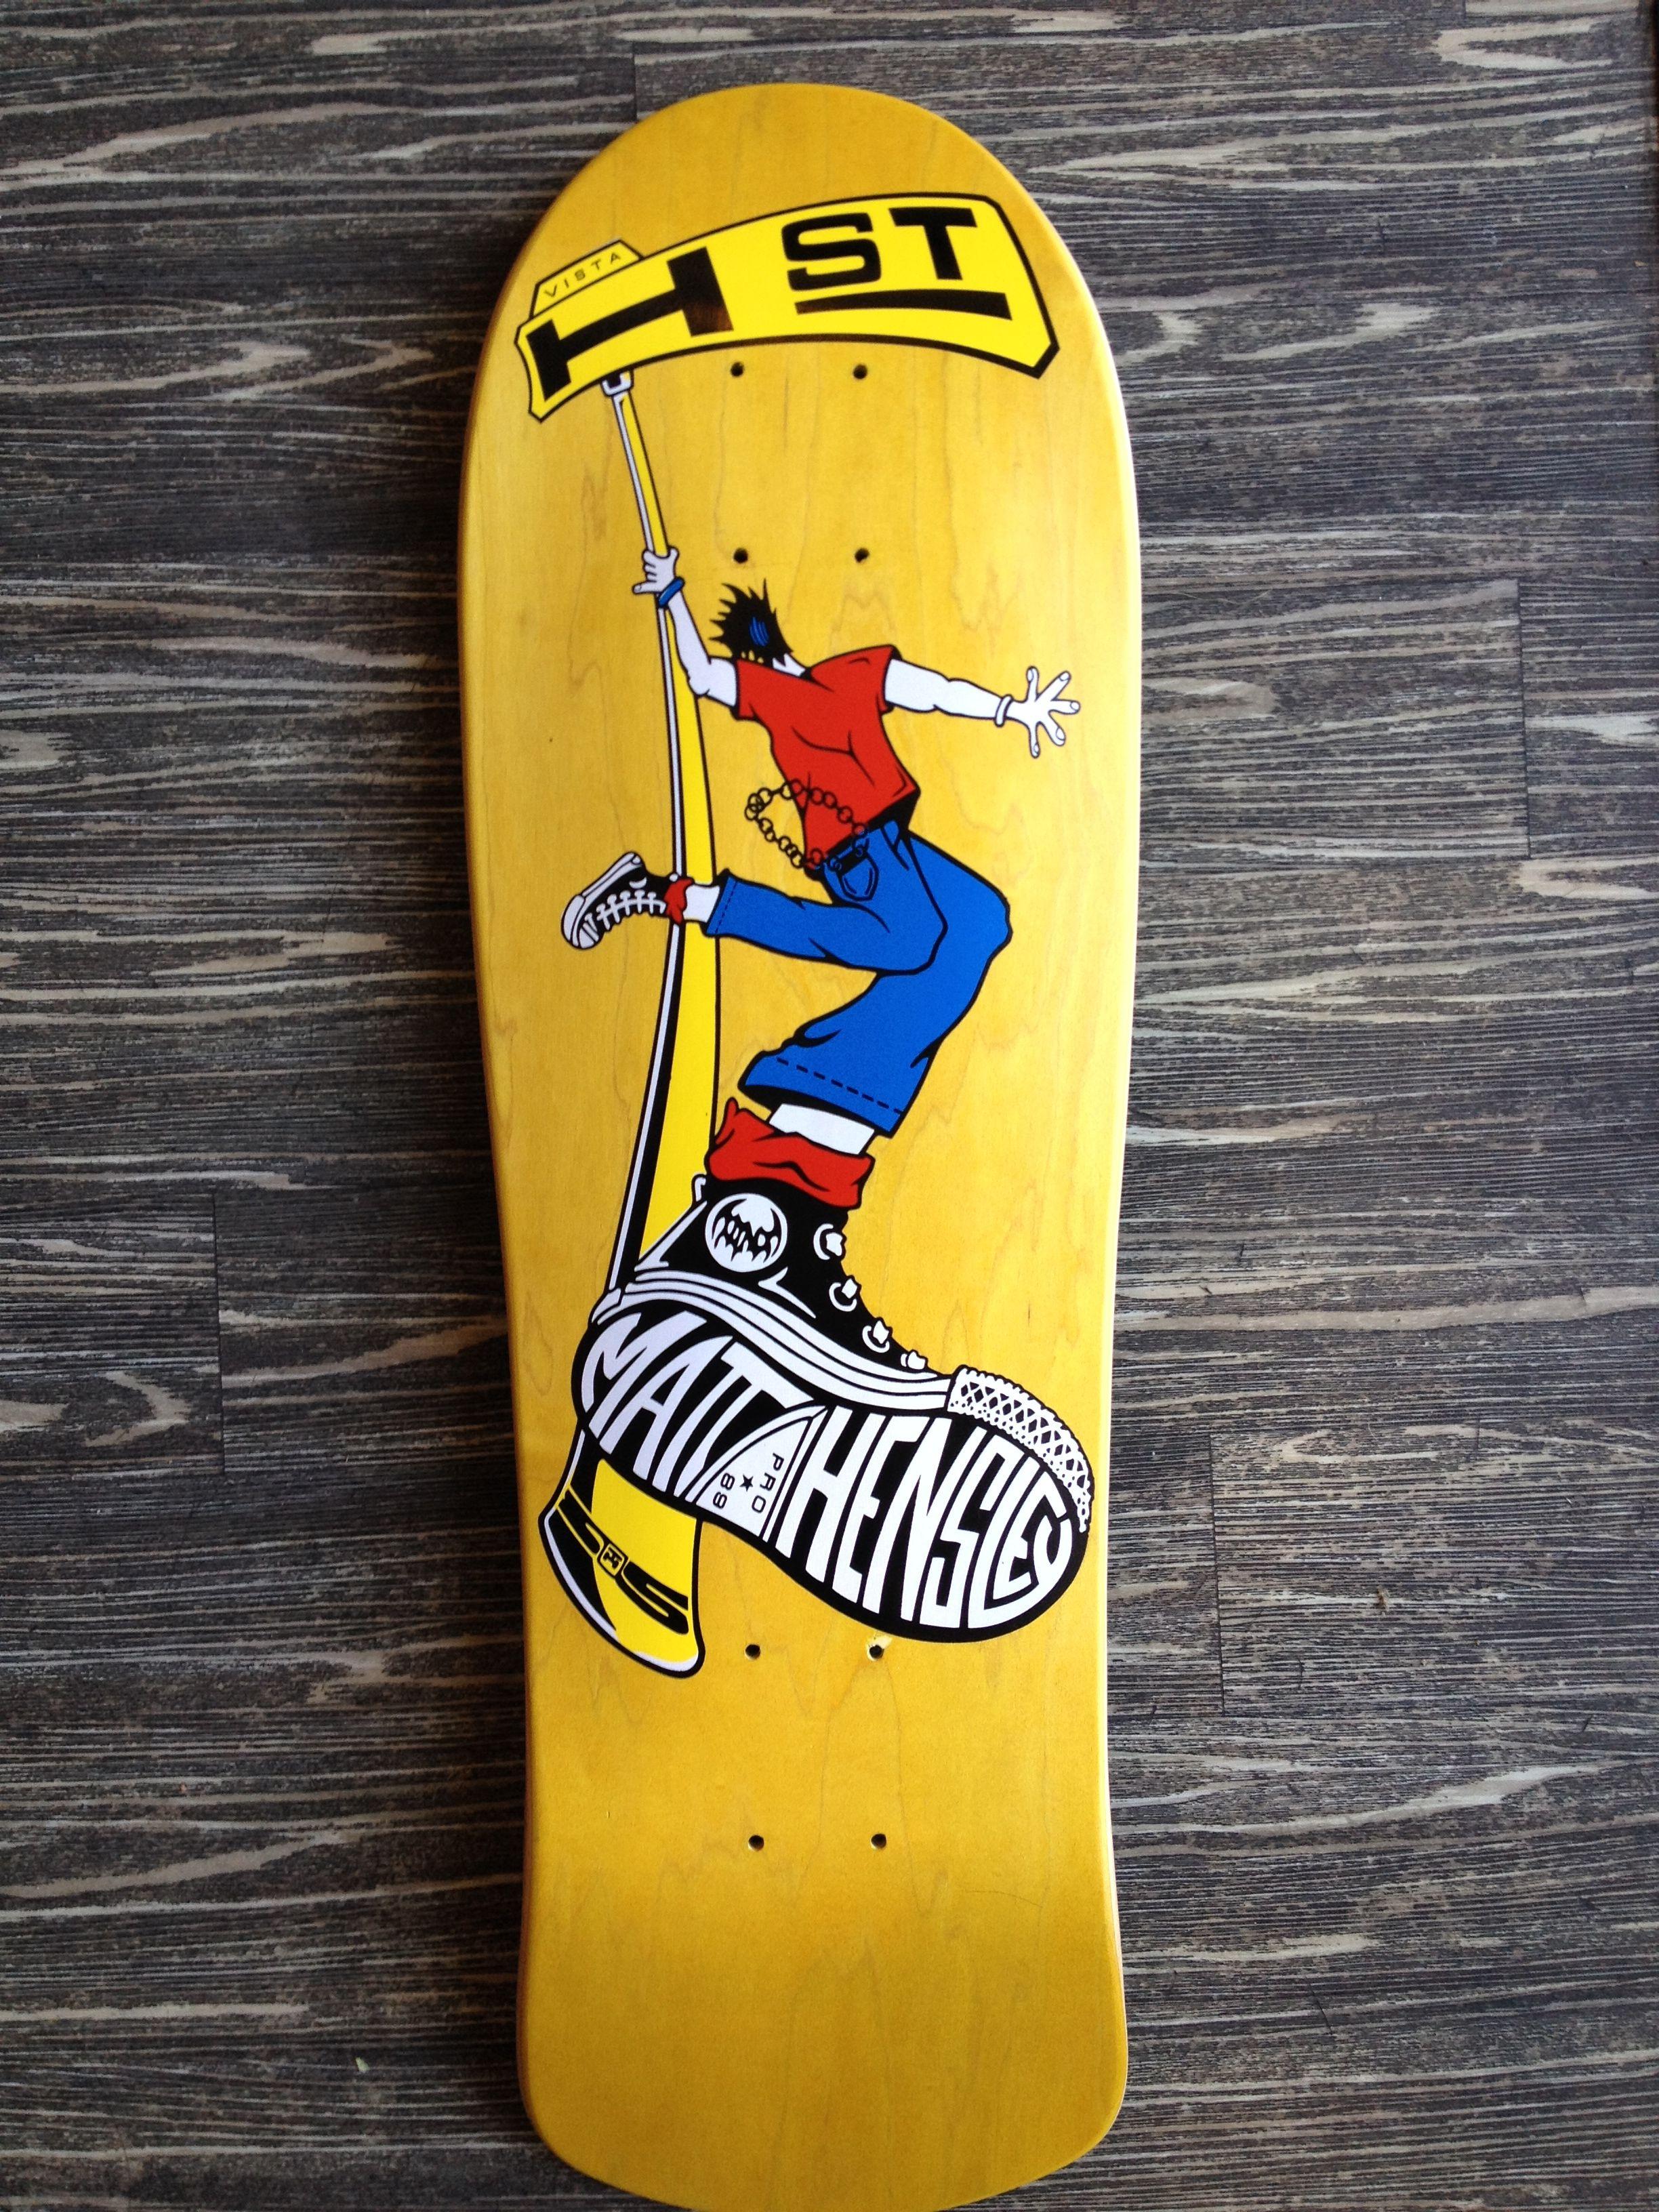 Skateboard Headboard matt hensley | skateboard deck | pinterest | skateboard and